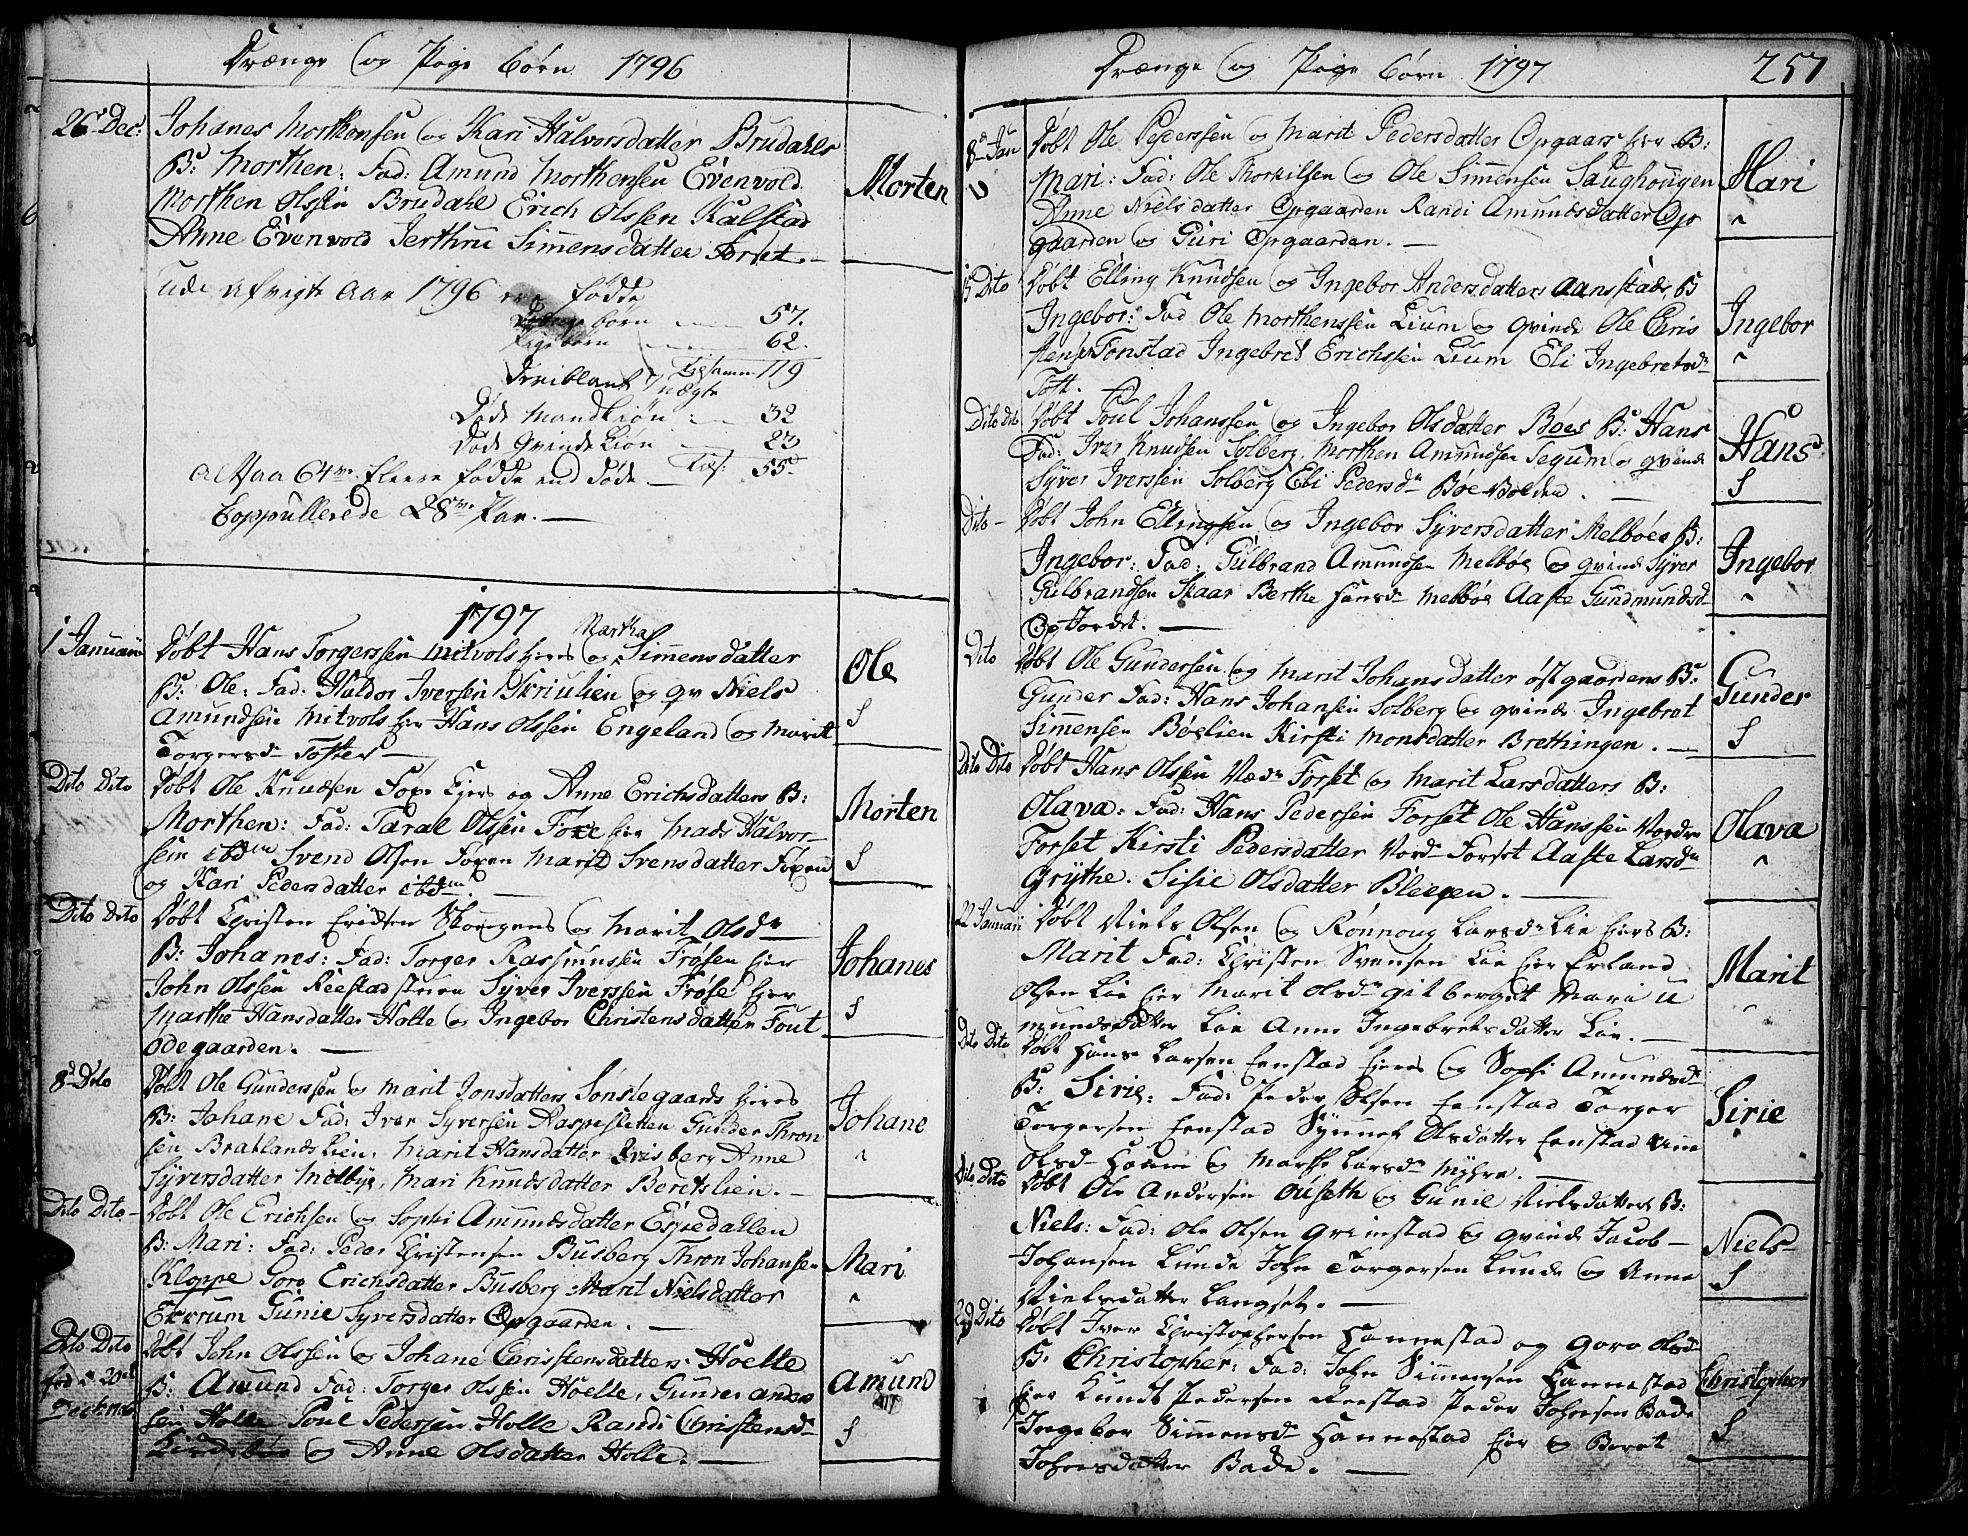 SAH, Gausdal prestekontor, Ministerialbok nr. 3, 1758-1809, s. 257